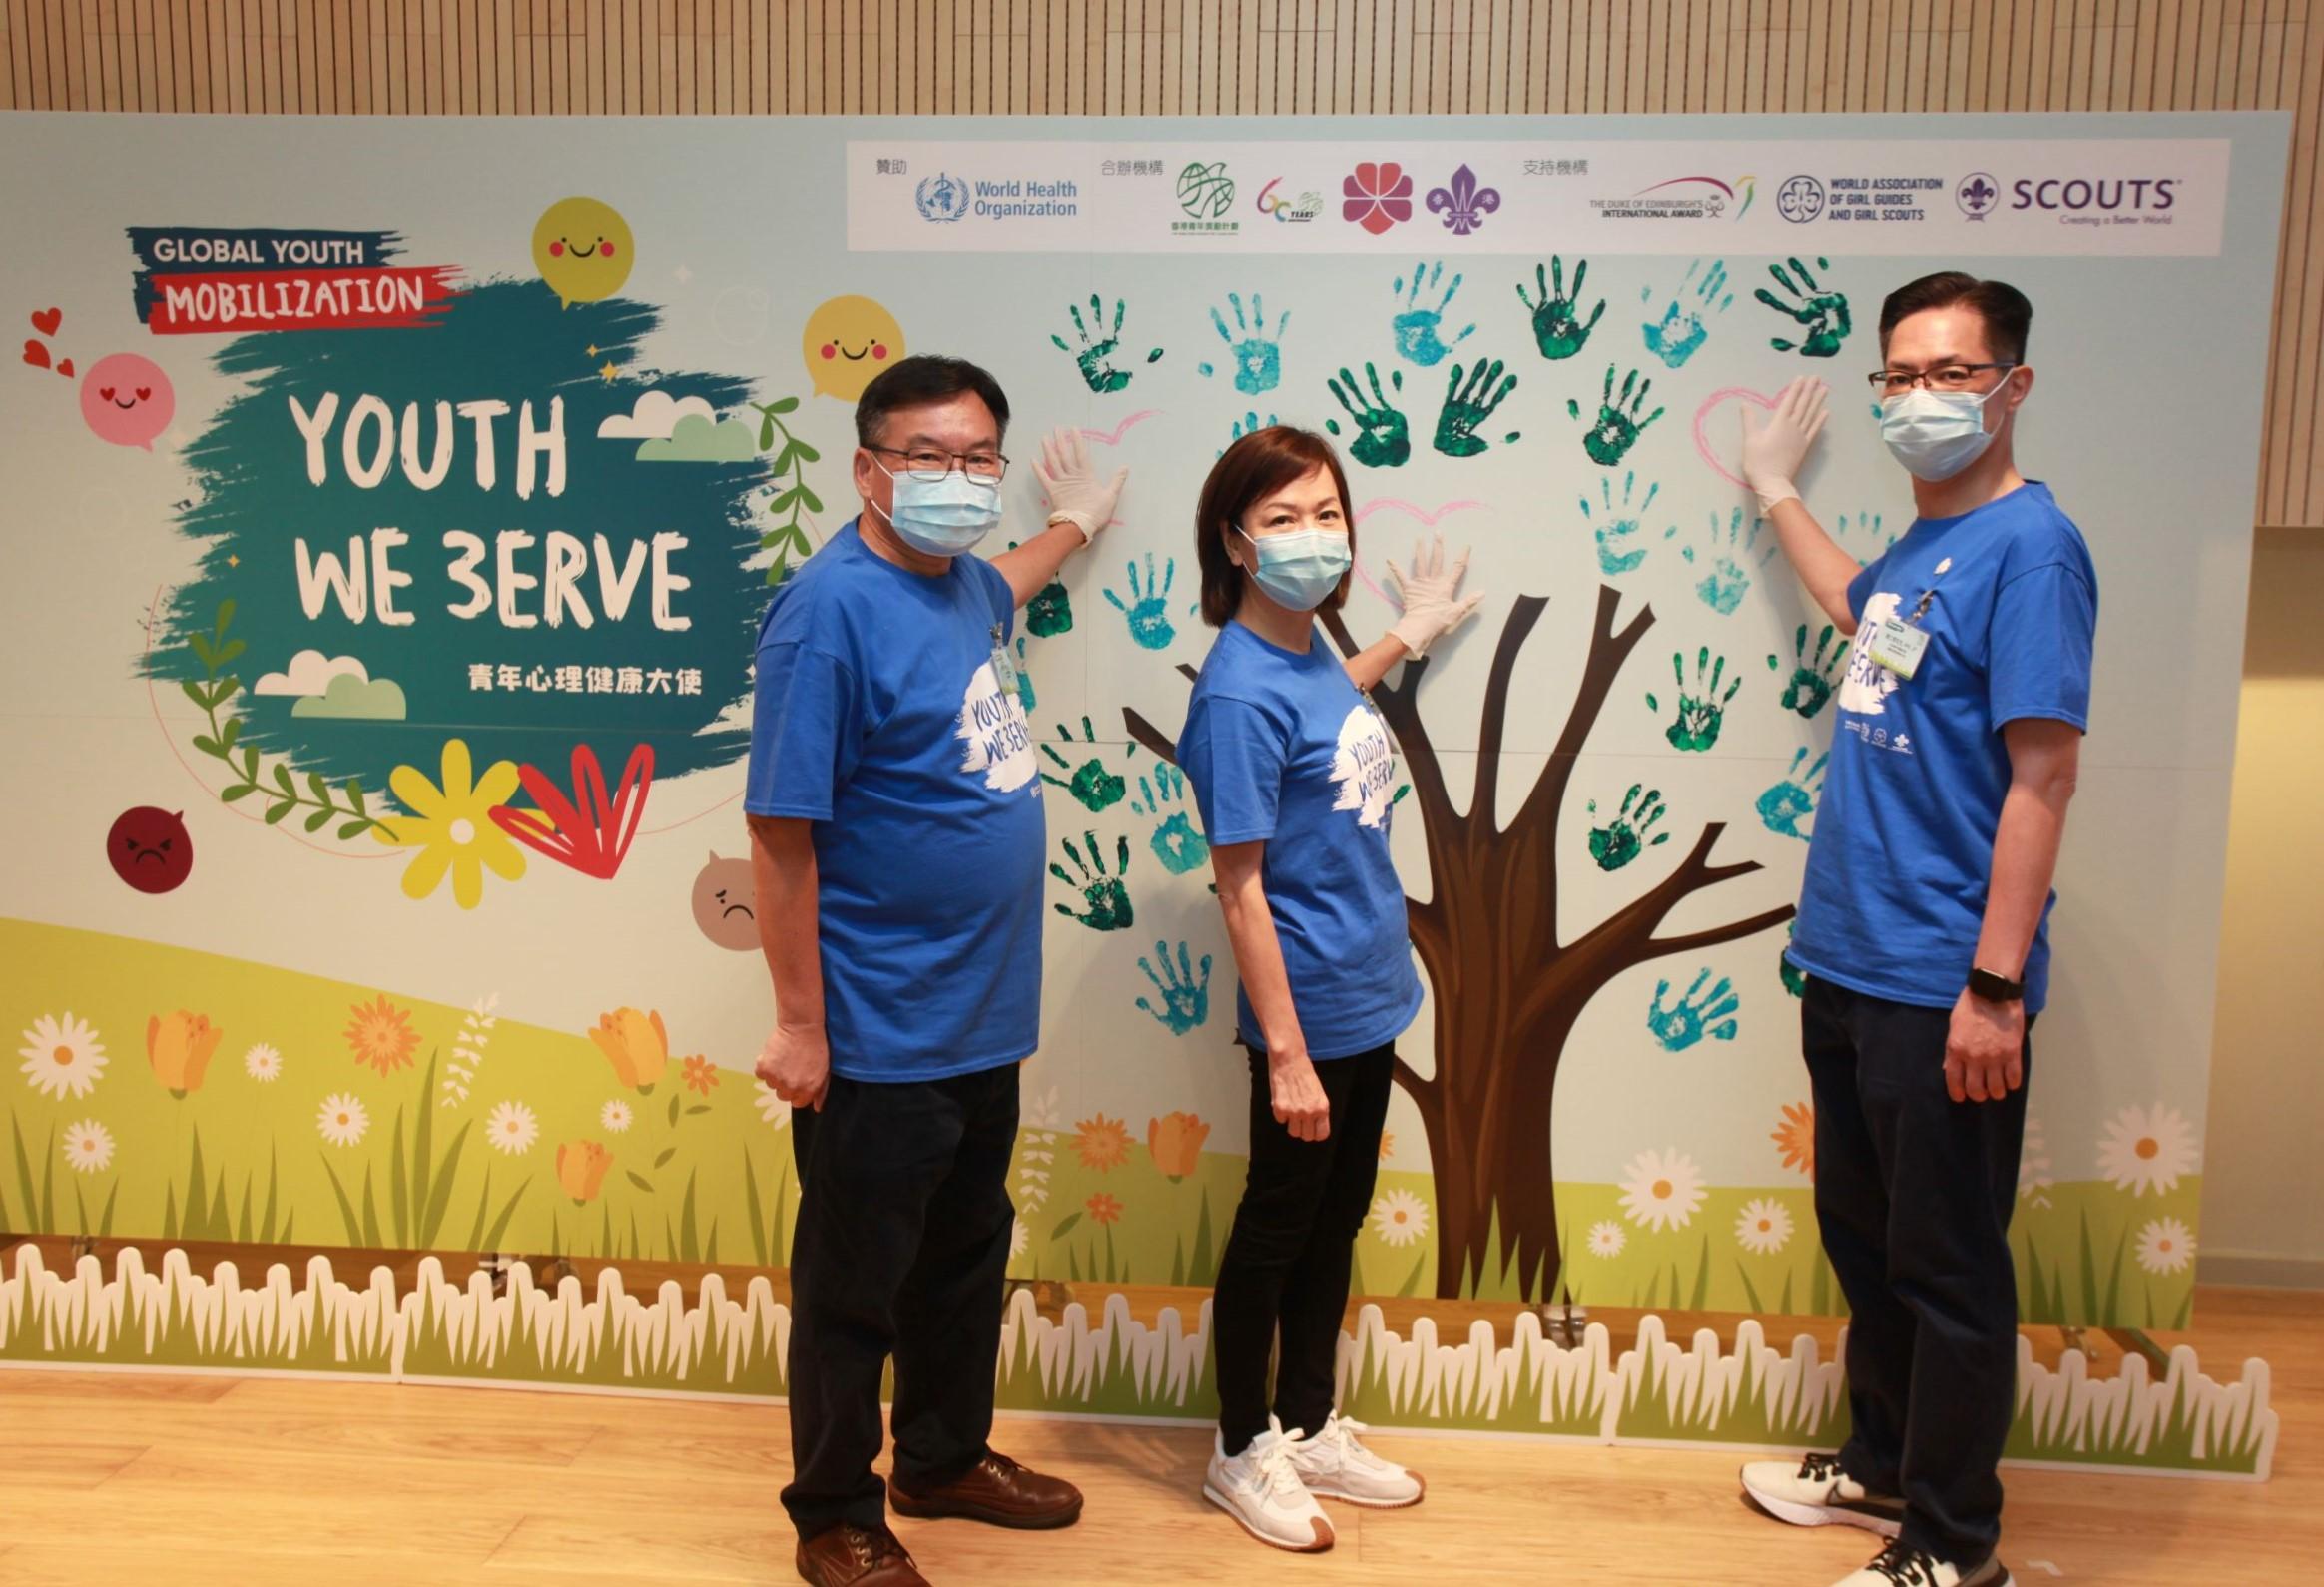 「YOUTH WE 3ERVE 」青年心理健康大使計劃 疫情下支援青年心理健康 將壓力轉化成正能量